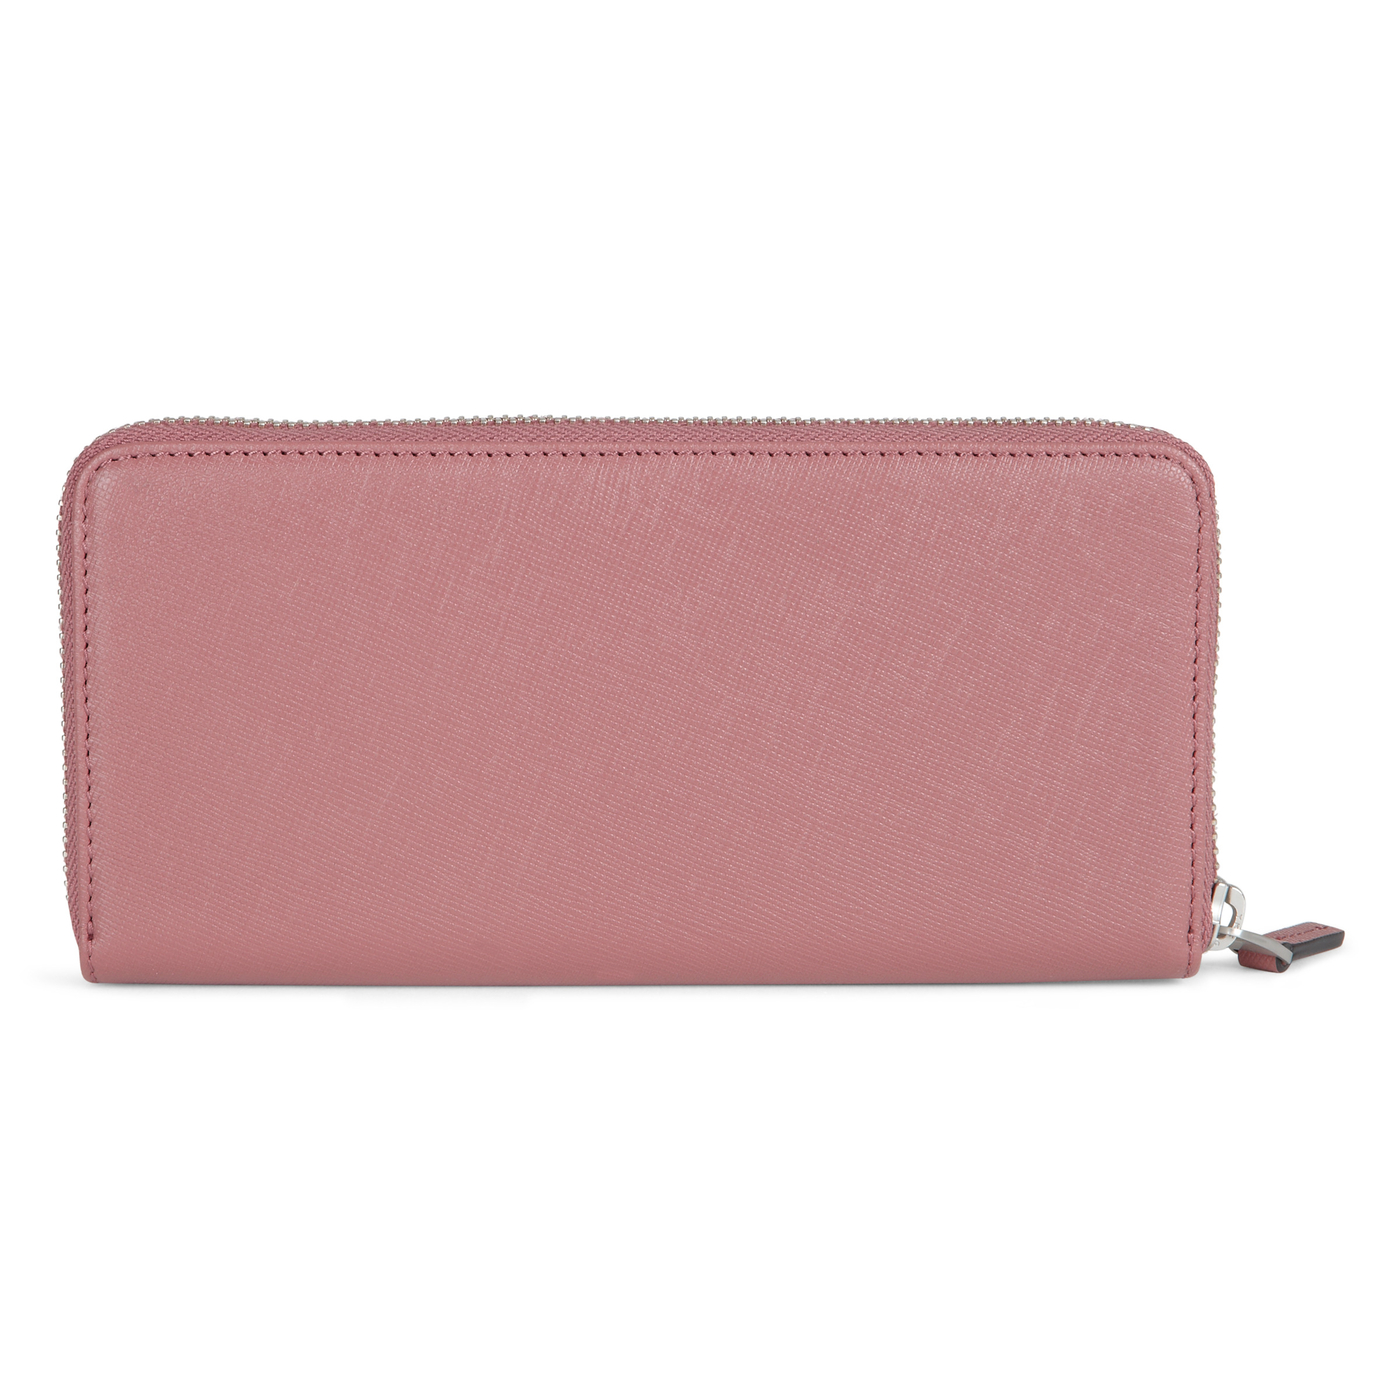 ECCO Felictiy Large Zip Wallet